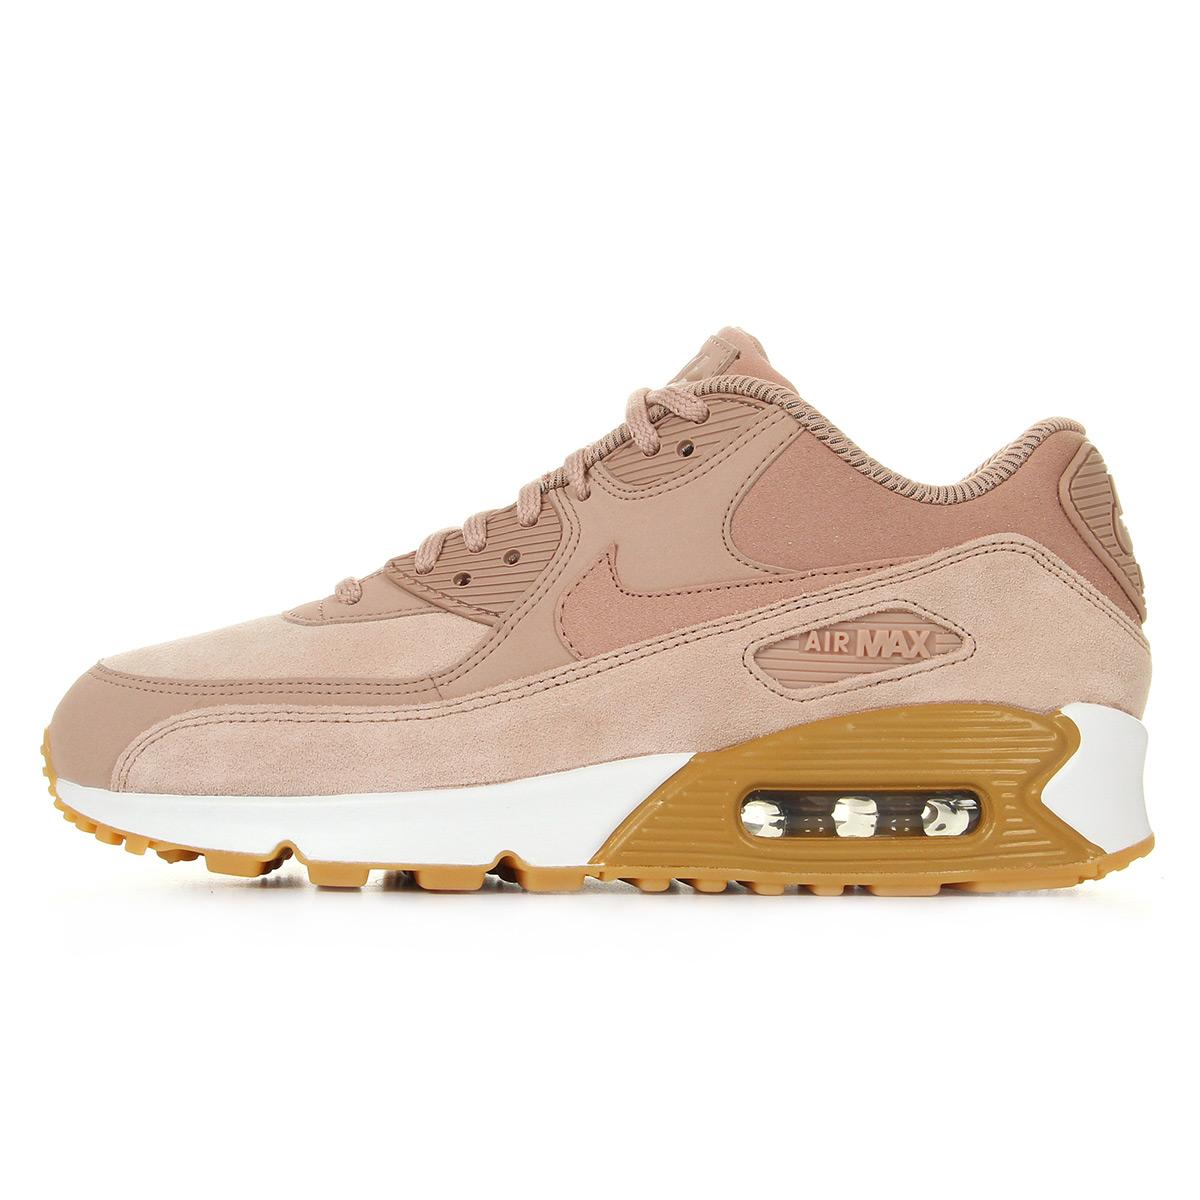 Nike WMNS Air Max 90 SE Particle Pink 881105601, Baskets mode femme